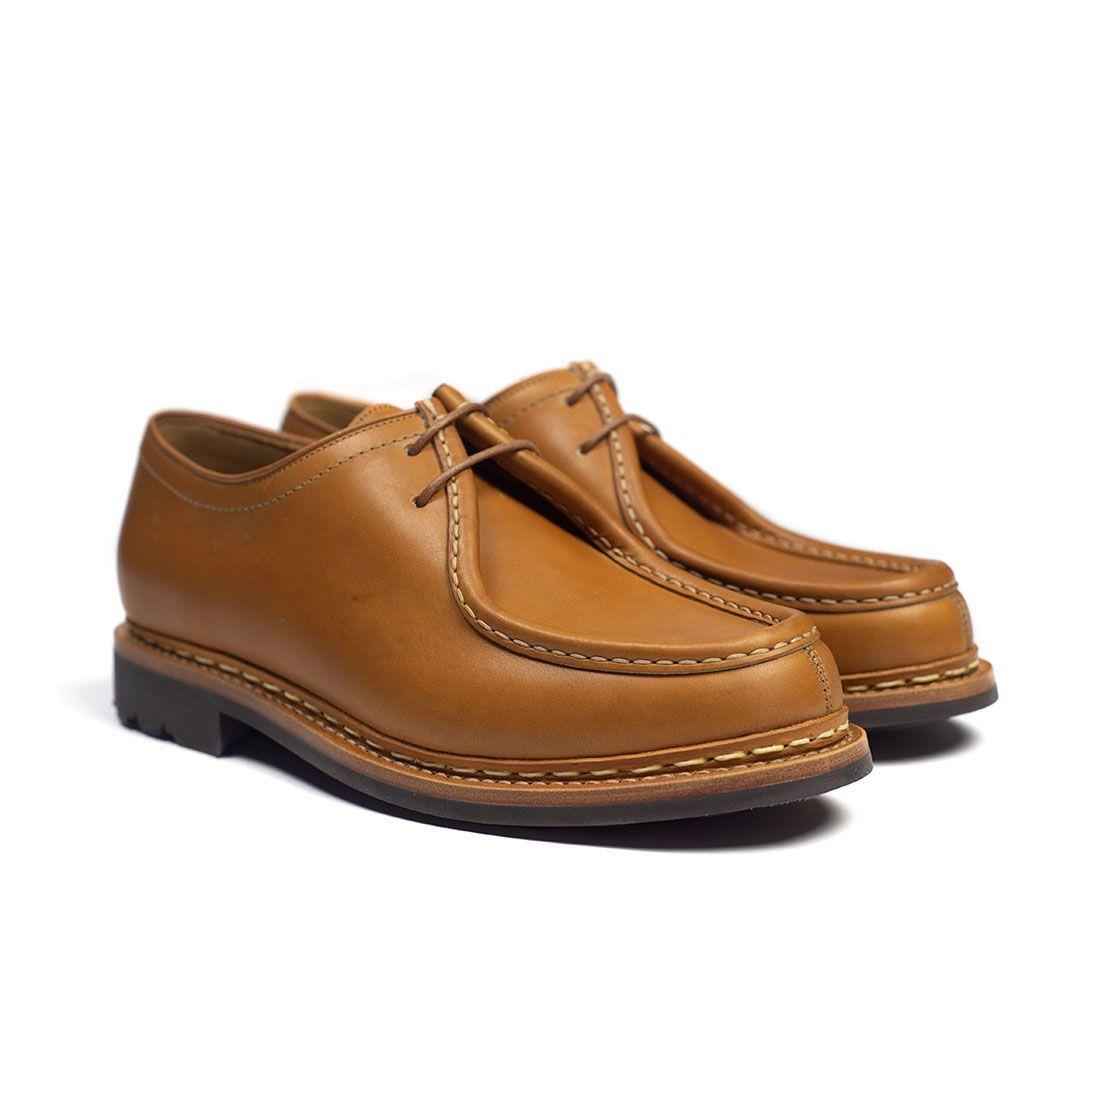 20210409 20190730 NMWA Heschung Thuya moccasin toe shoe in naturel chestnut calf rubber sole 01.jpg